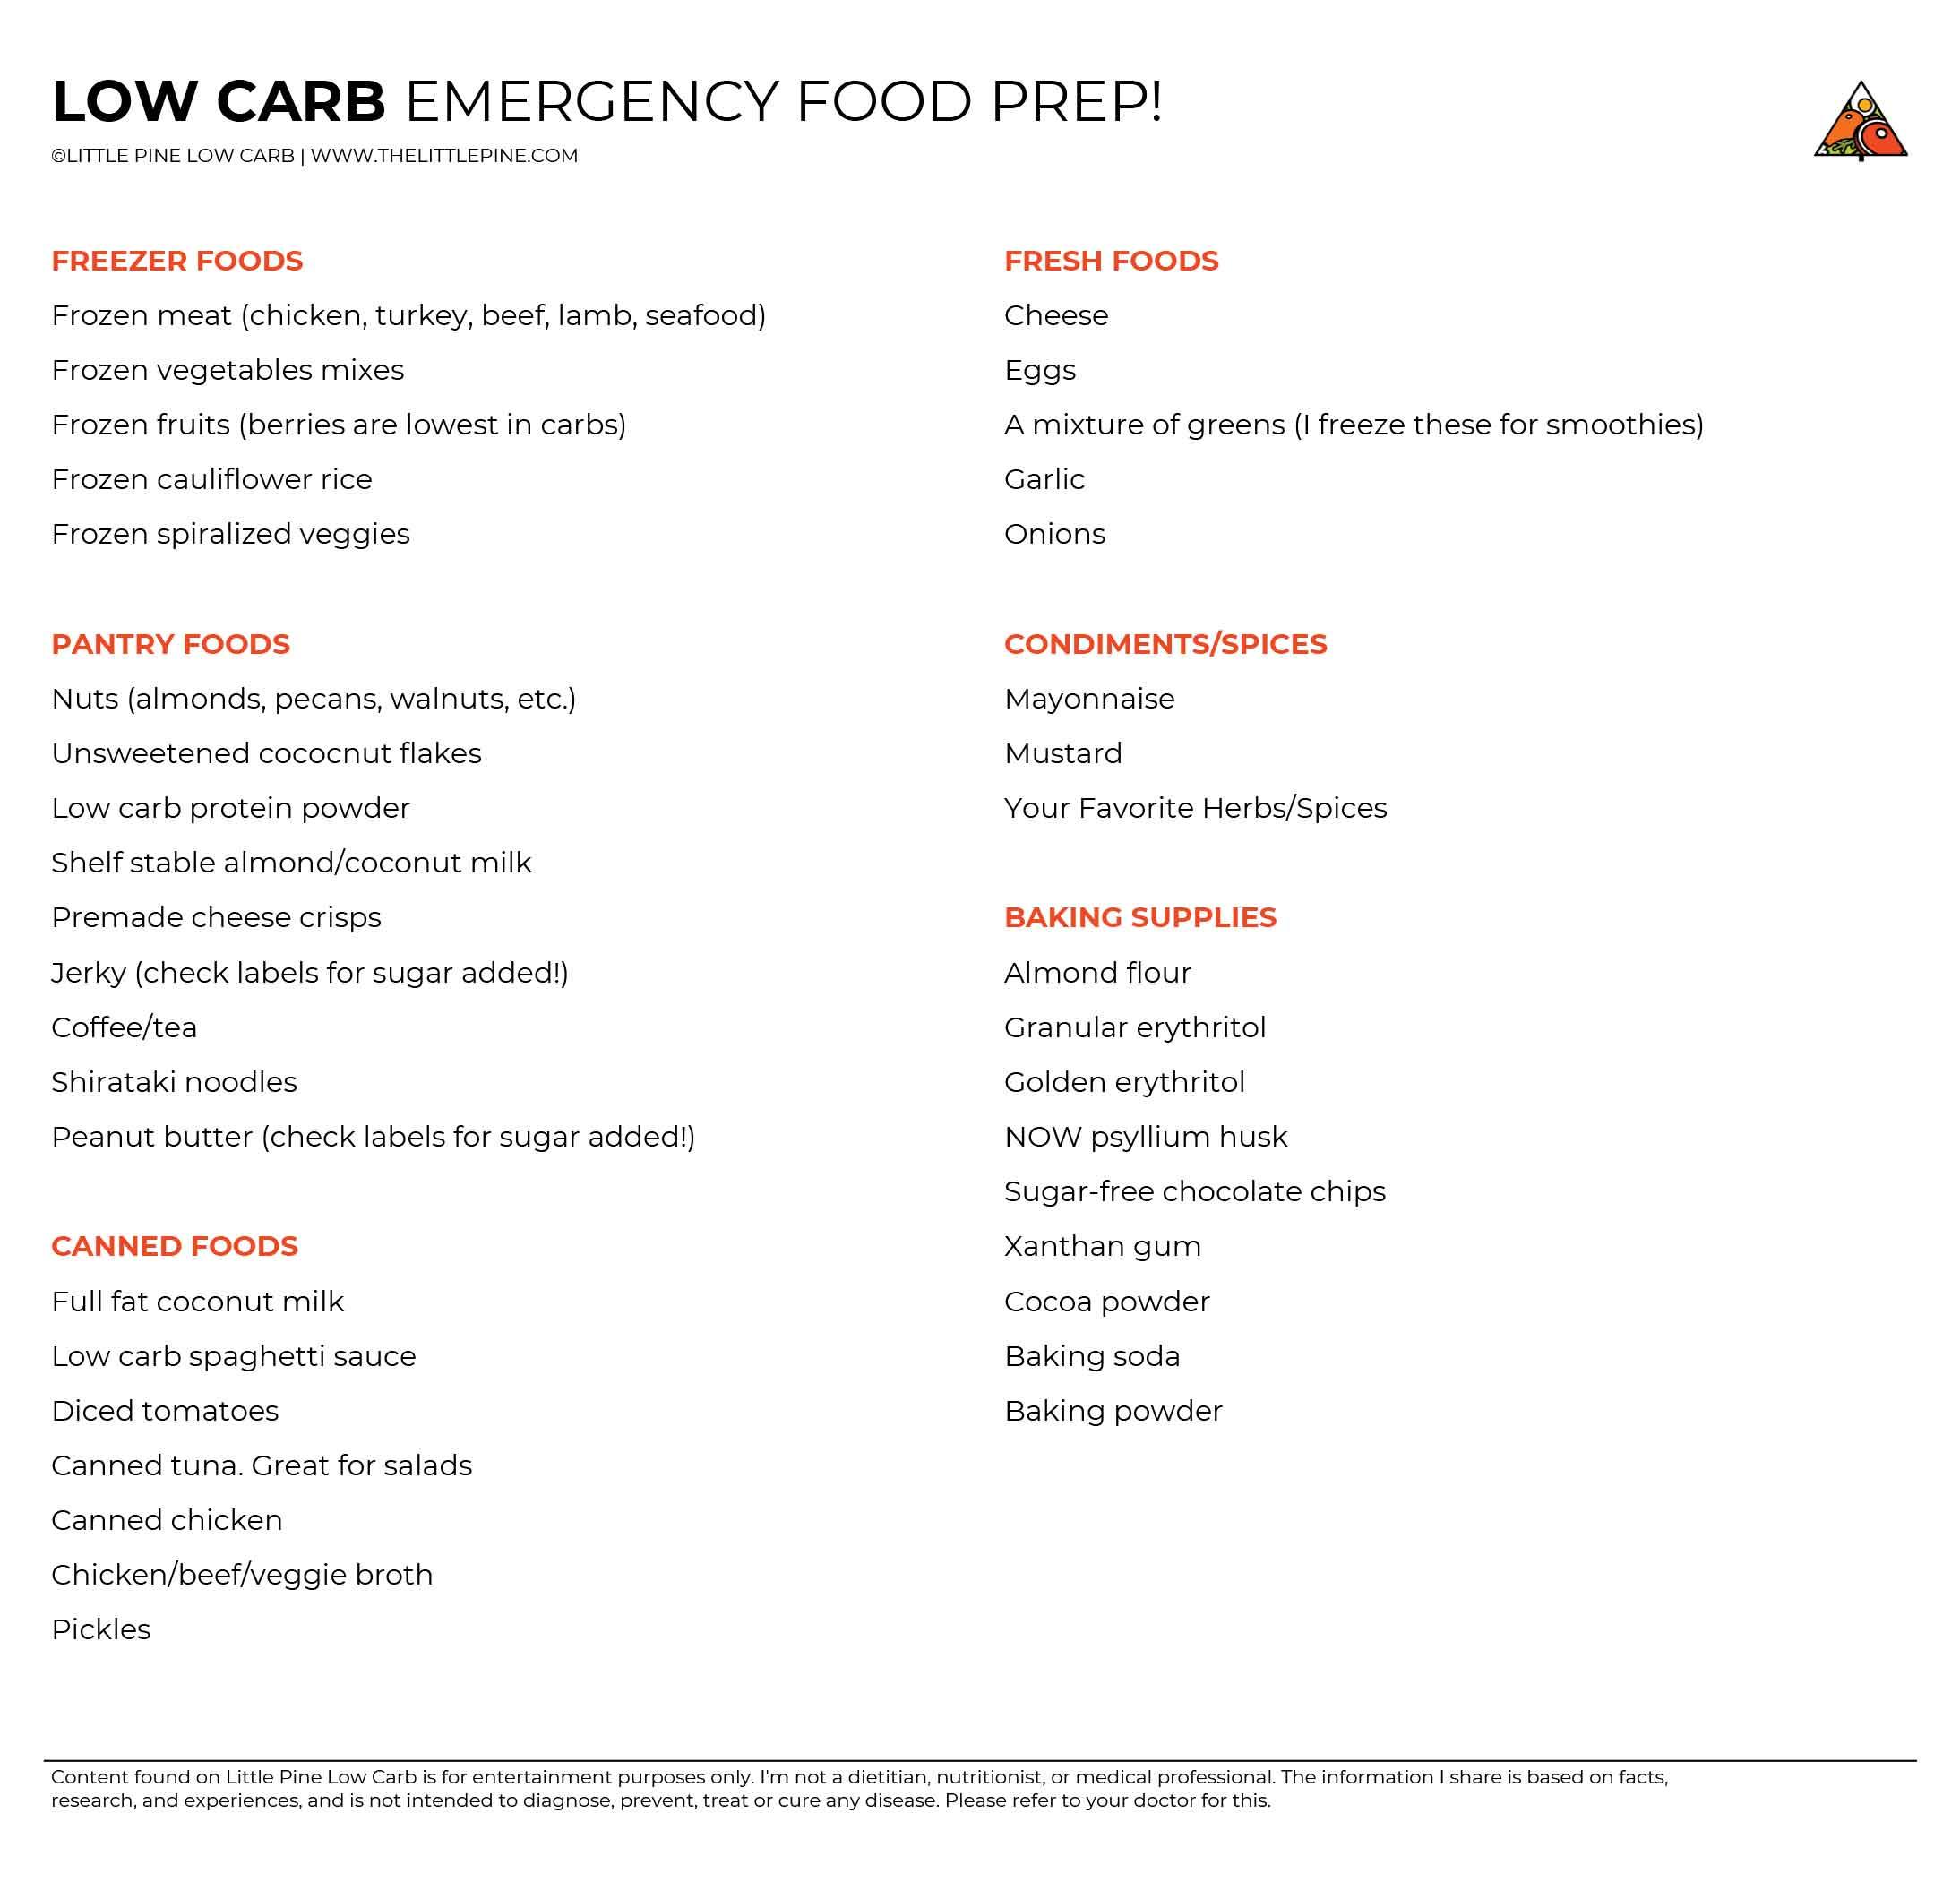 Emergency-Food-Prep shopping list